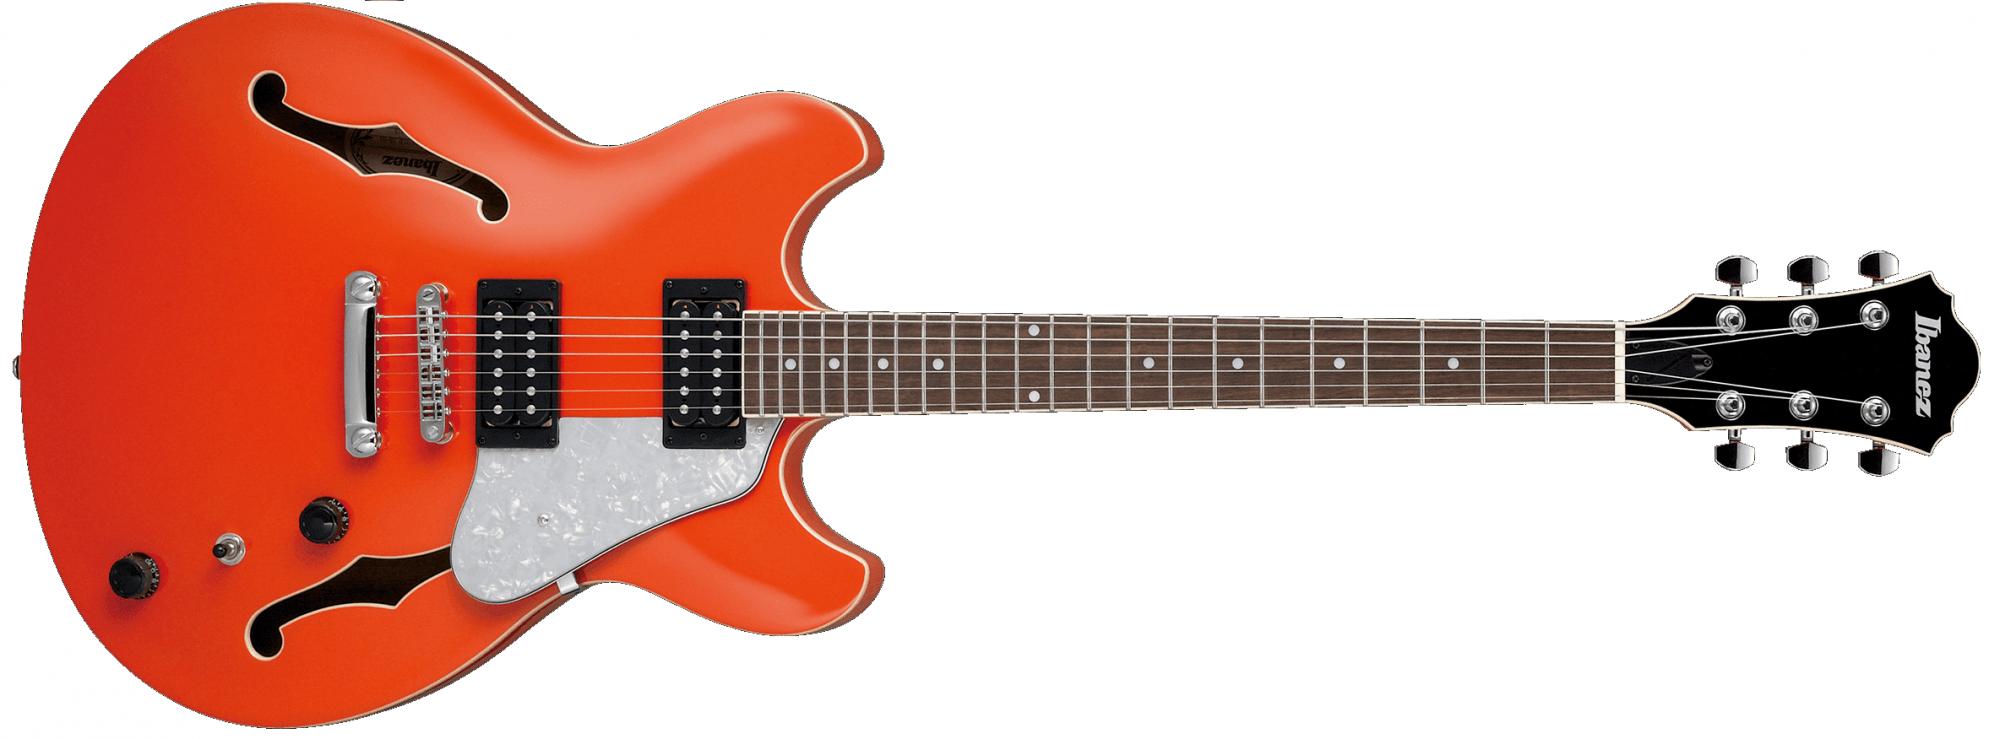 Ibanez AS63TLO Artcore Vibrante Hollow Body Electric Guitar, Twilight Orange